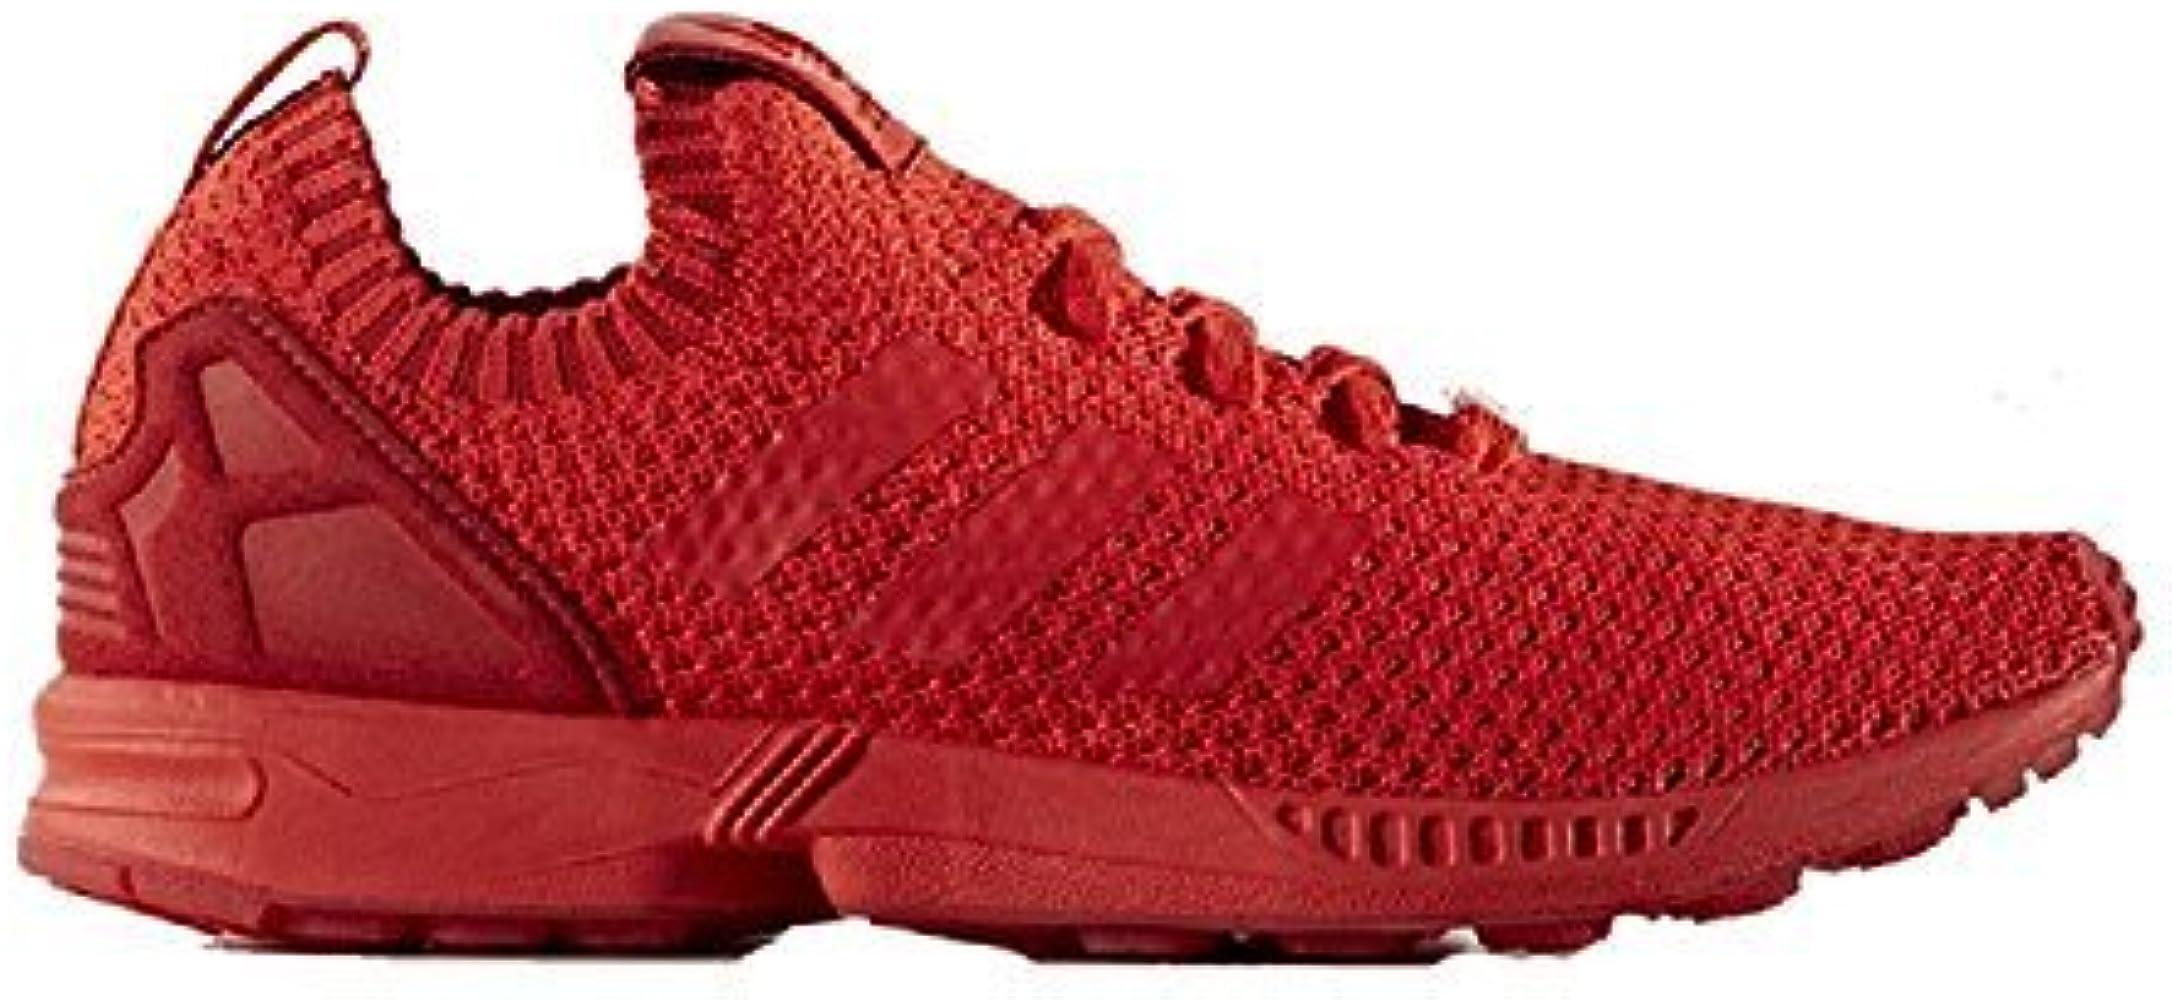 adidas zx flux rosso uomo